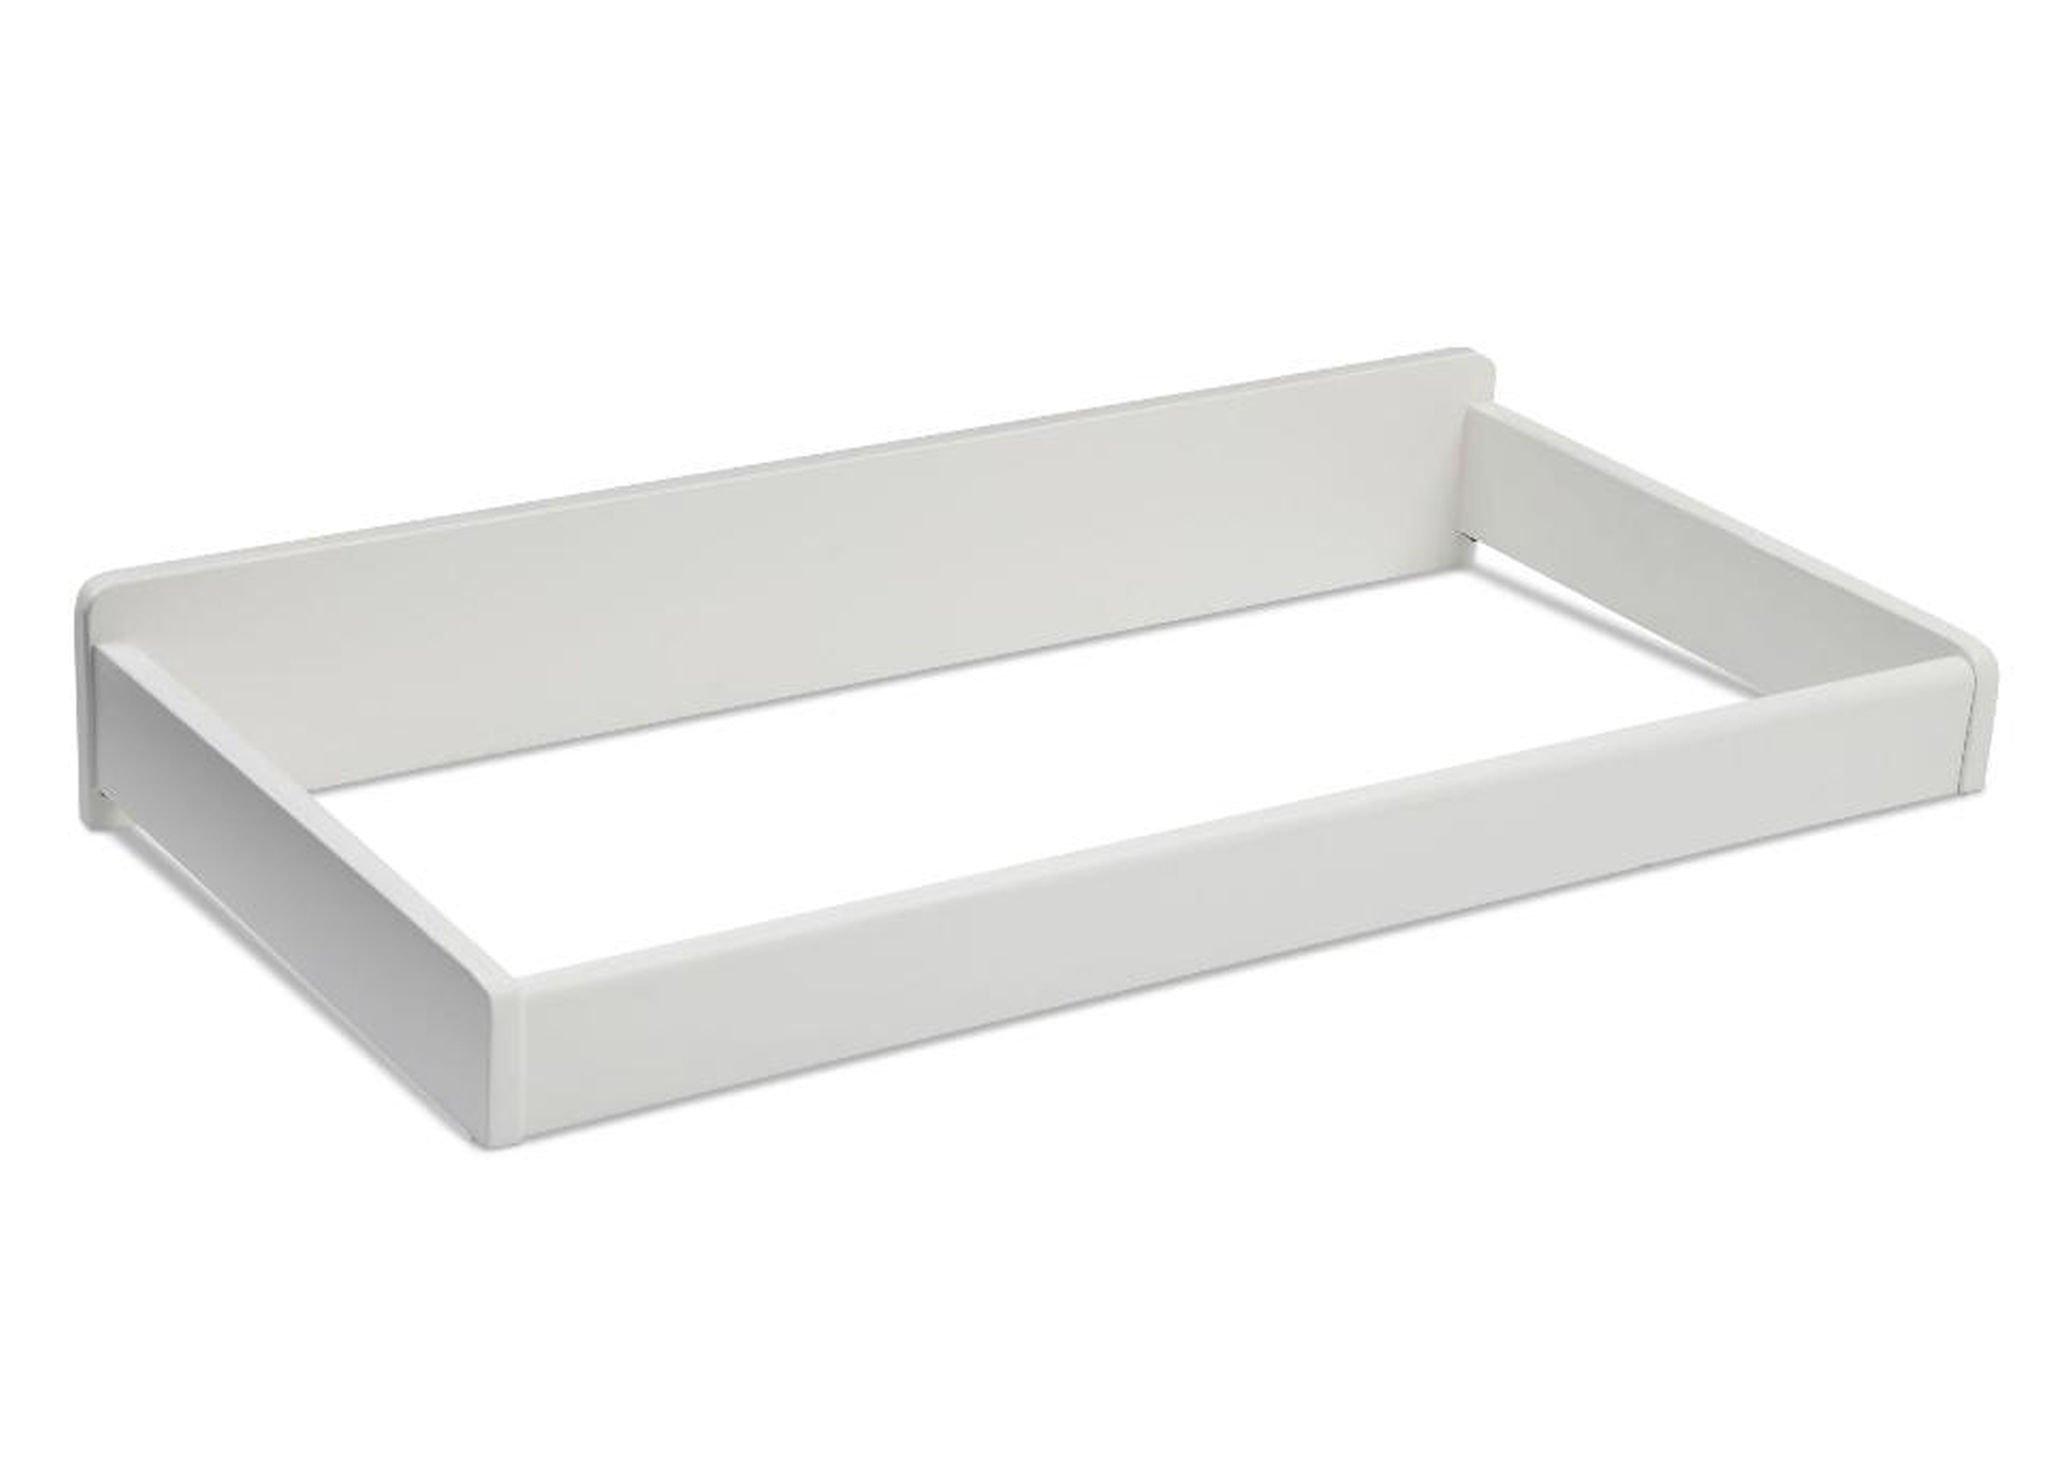 Delta Children Bennington Elite Changing Table Topper - White